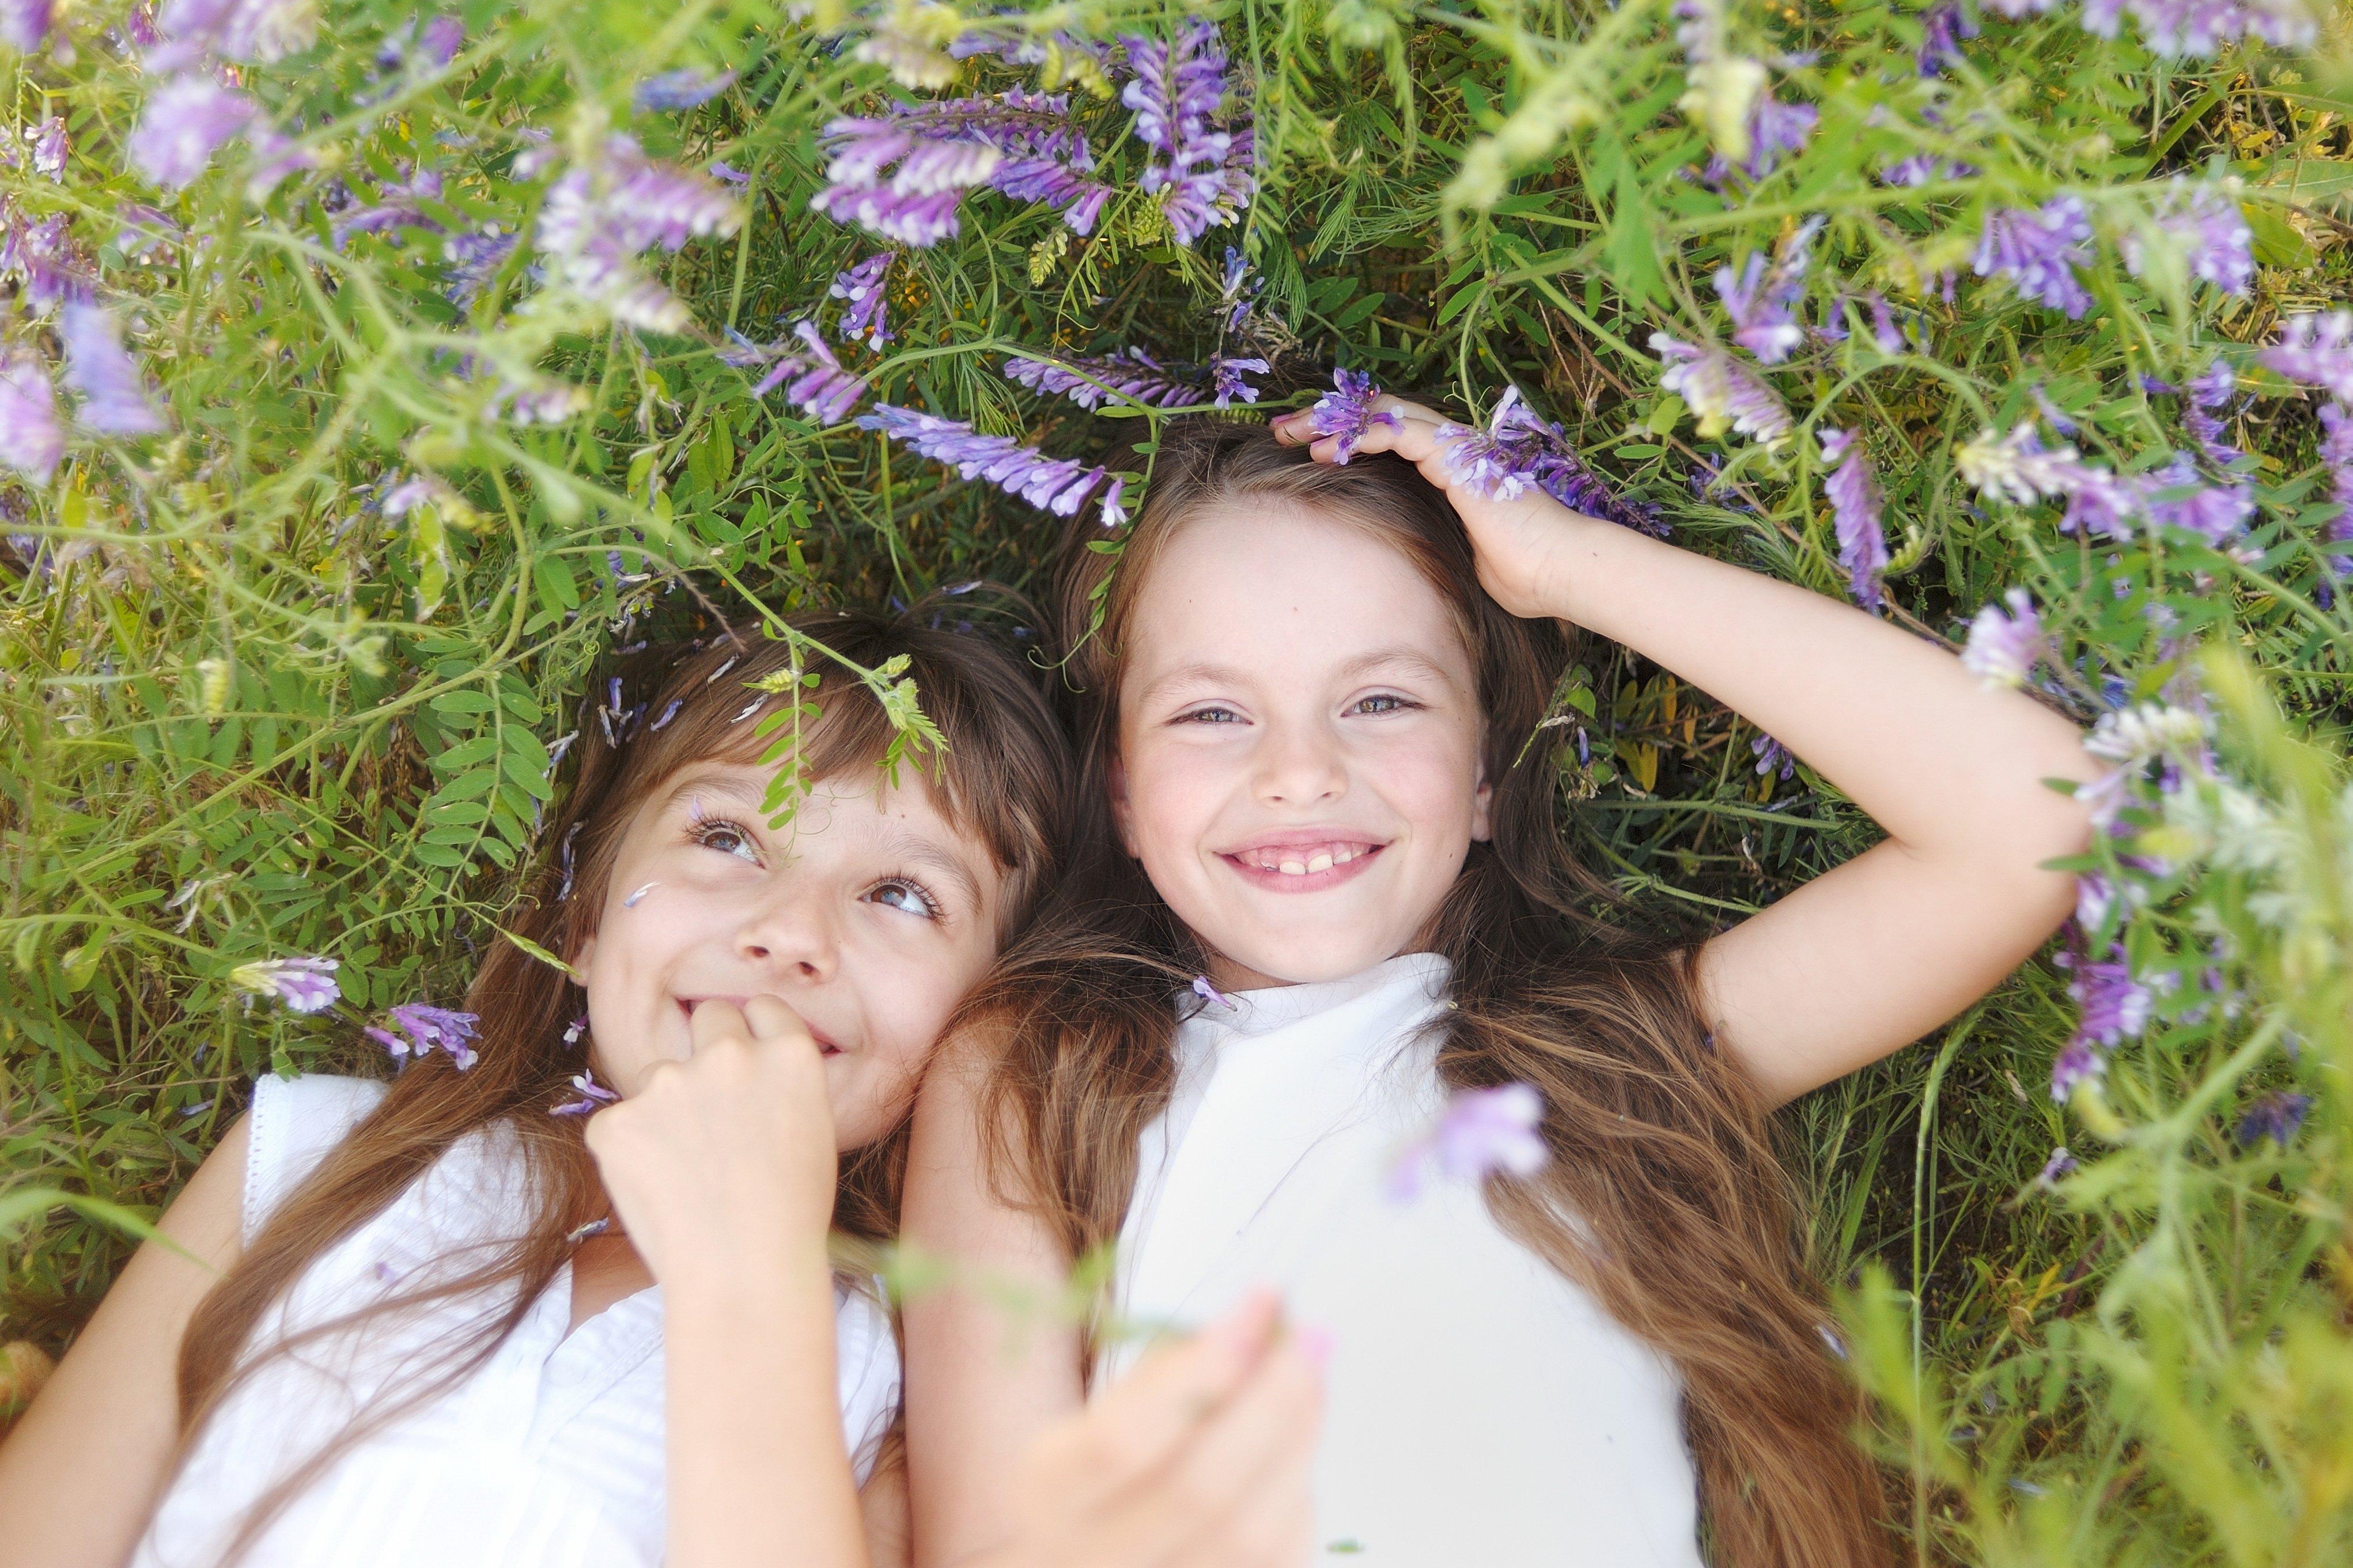 wiersz na Dzień Dziecka Julian Ejsmond uśmiech dziecka